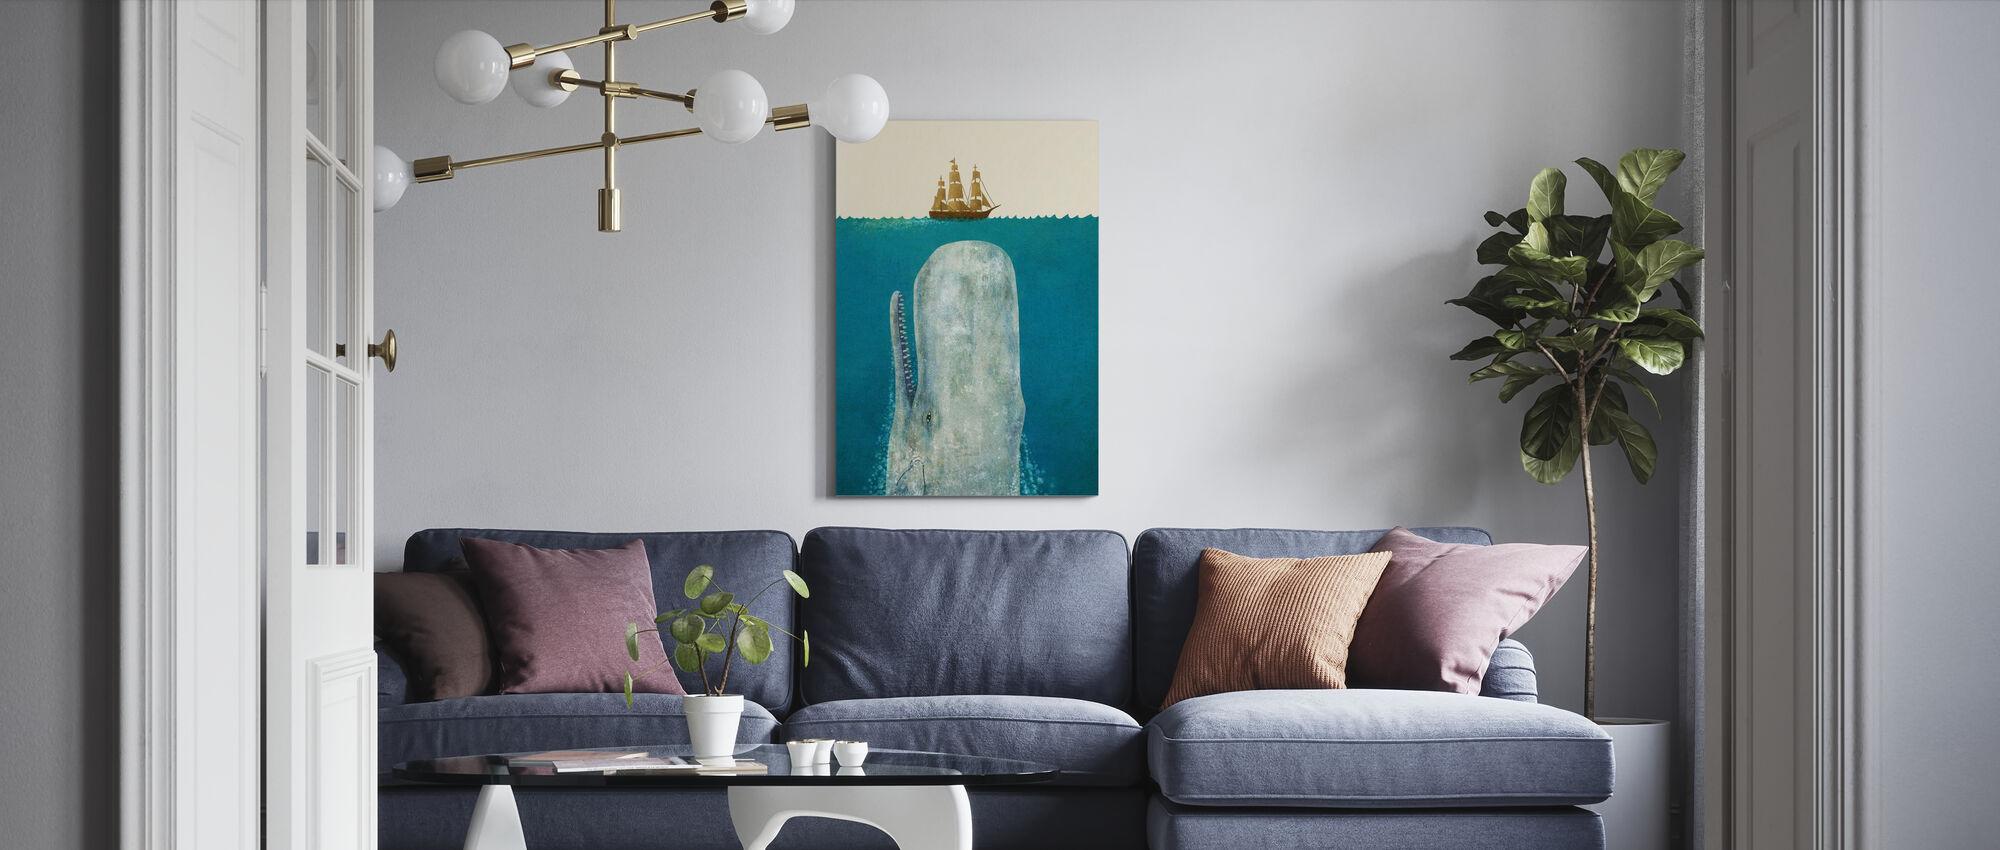 Balena - Stampa su tela - Salotto